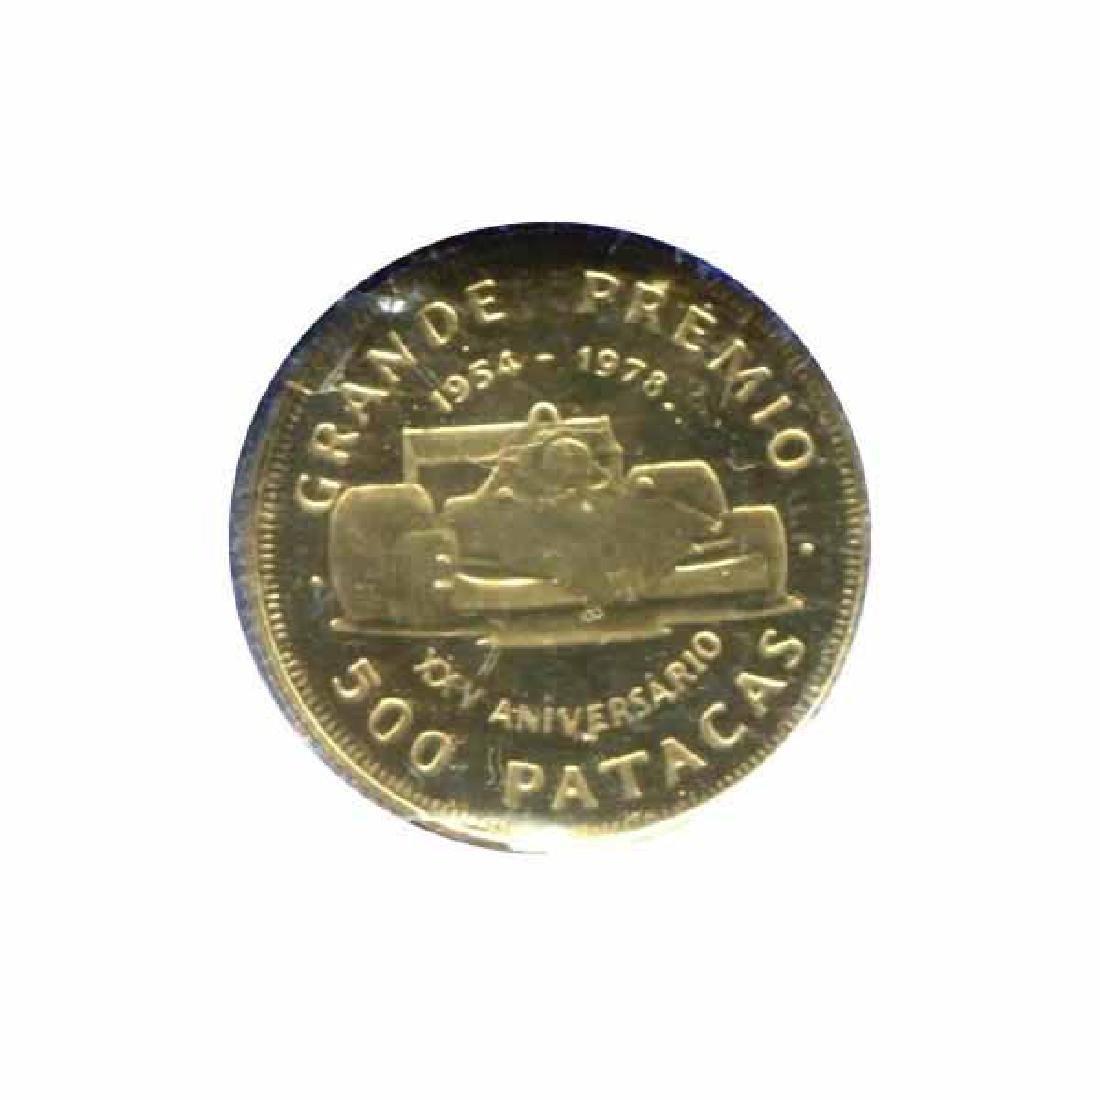 Macau 500 Patacas Gold 1978 PF